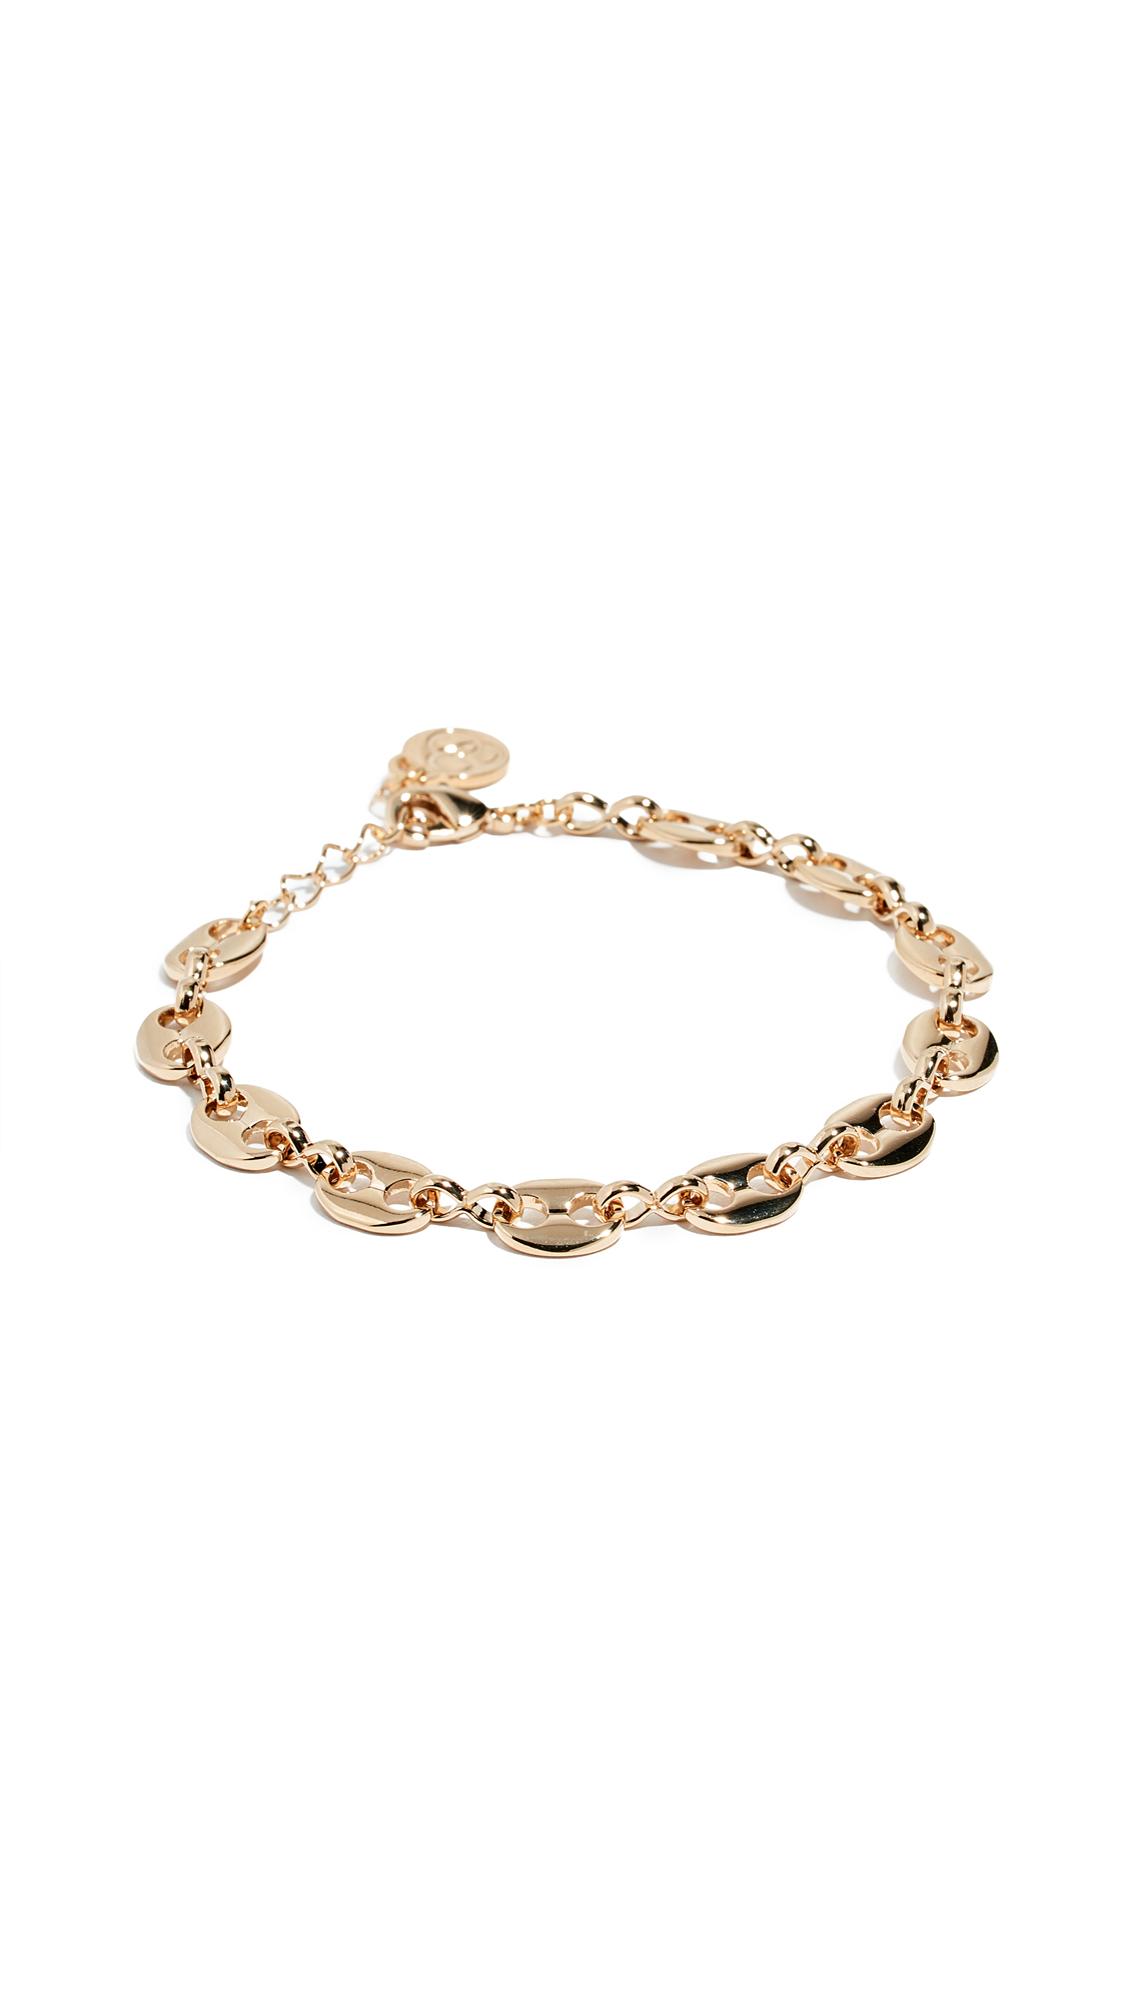 CLOVERPOST Bay Bracelet in Gold